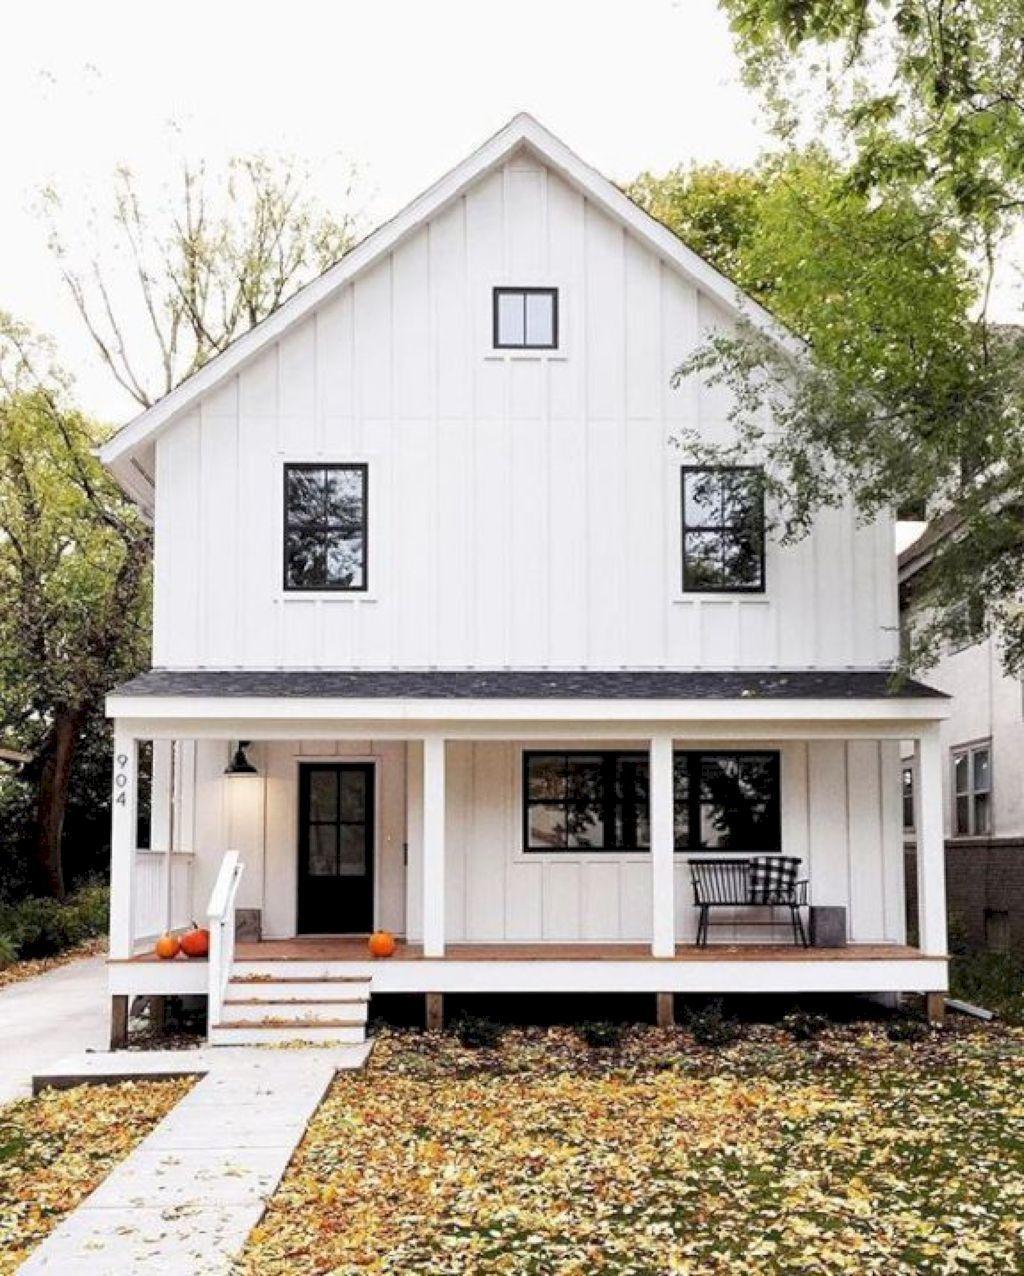 Nice Home Exterior Design Ideas Siding Illustration - Home ...